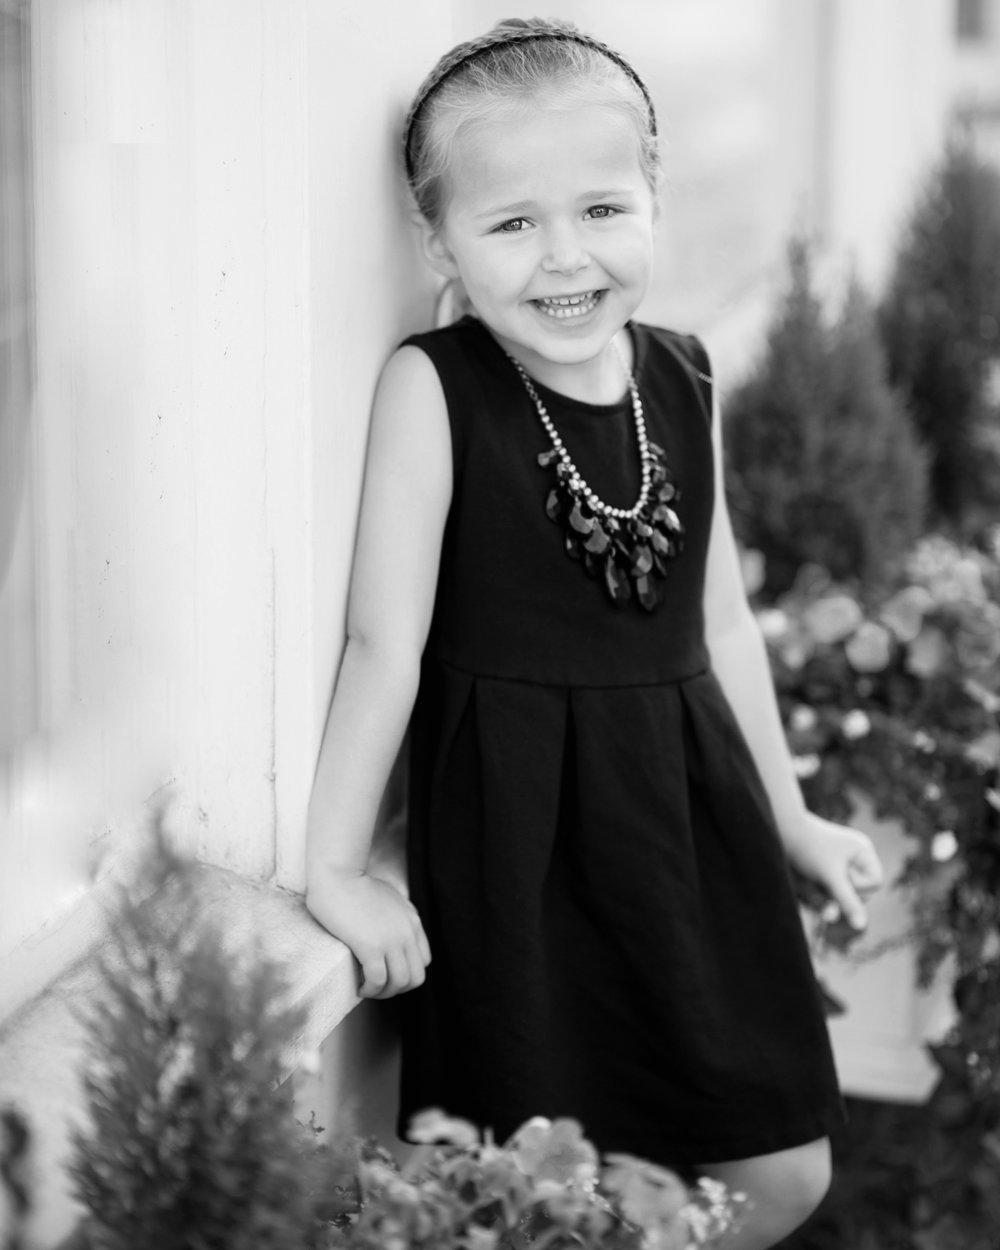 Maureen_Ford_Photography_Kids_0005.JPG